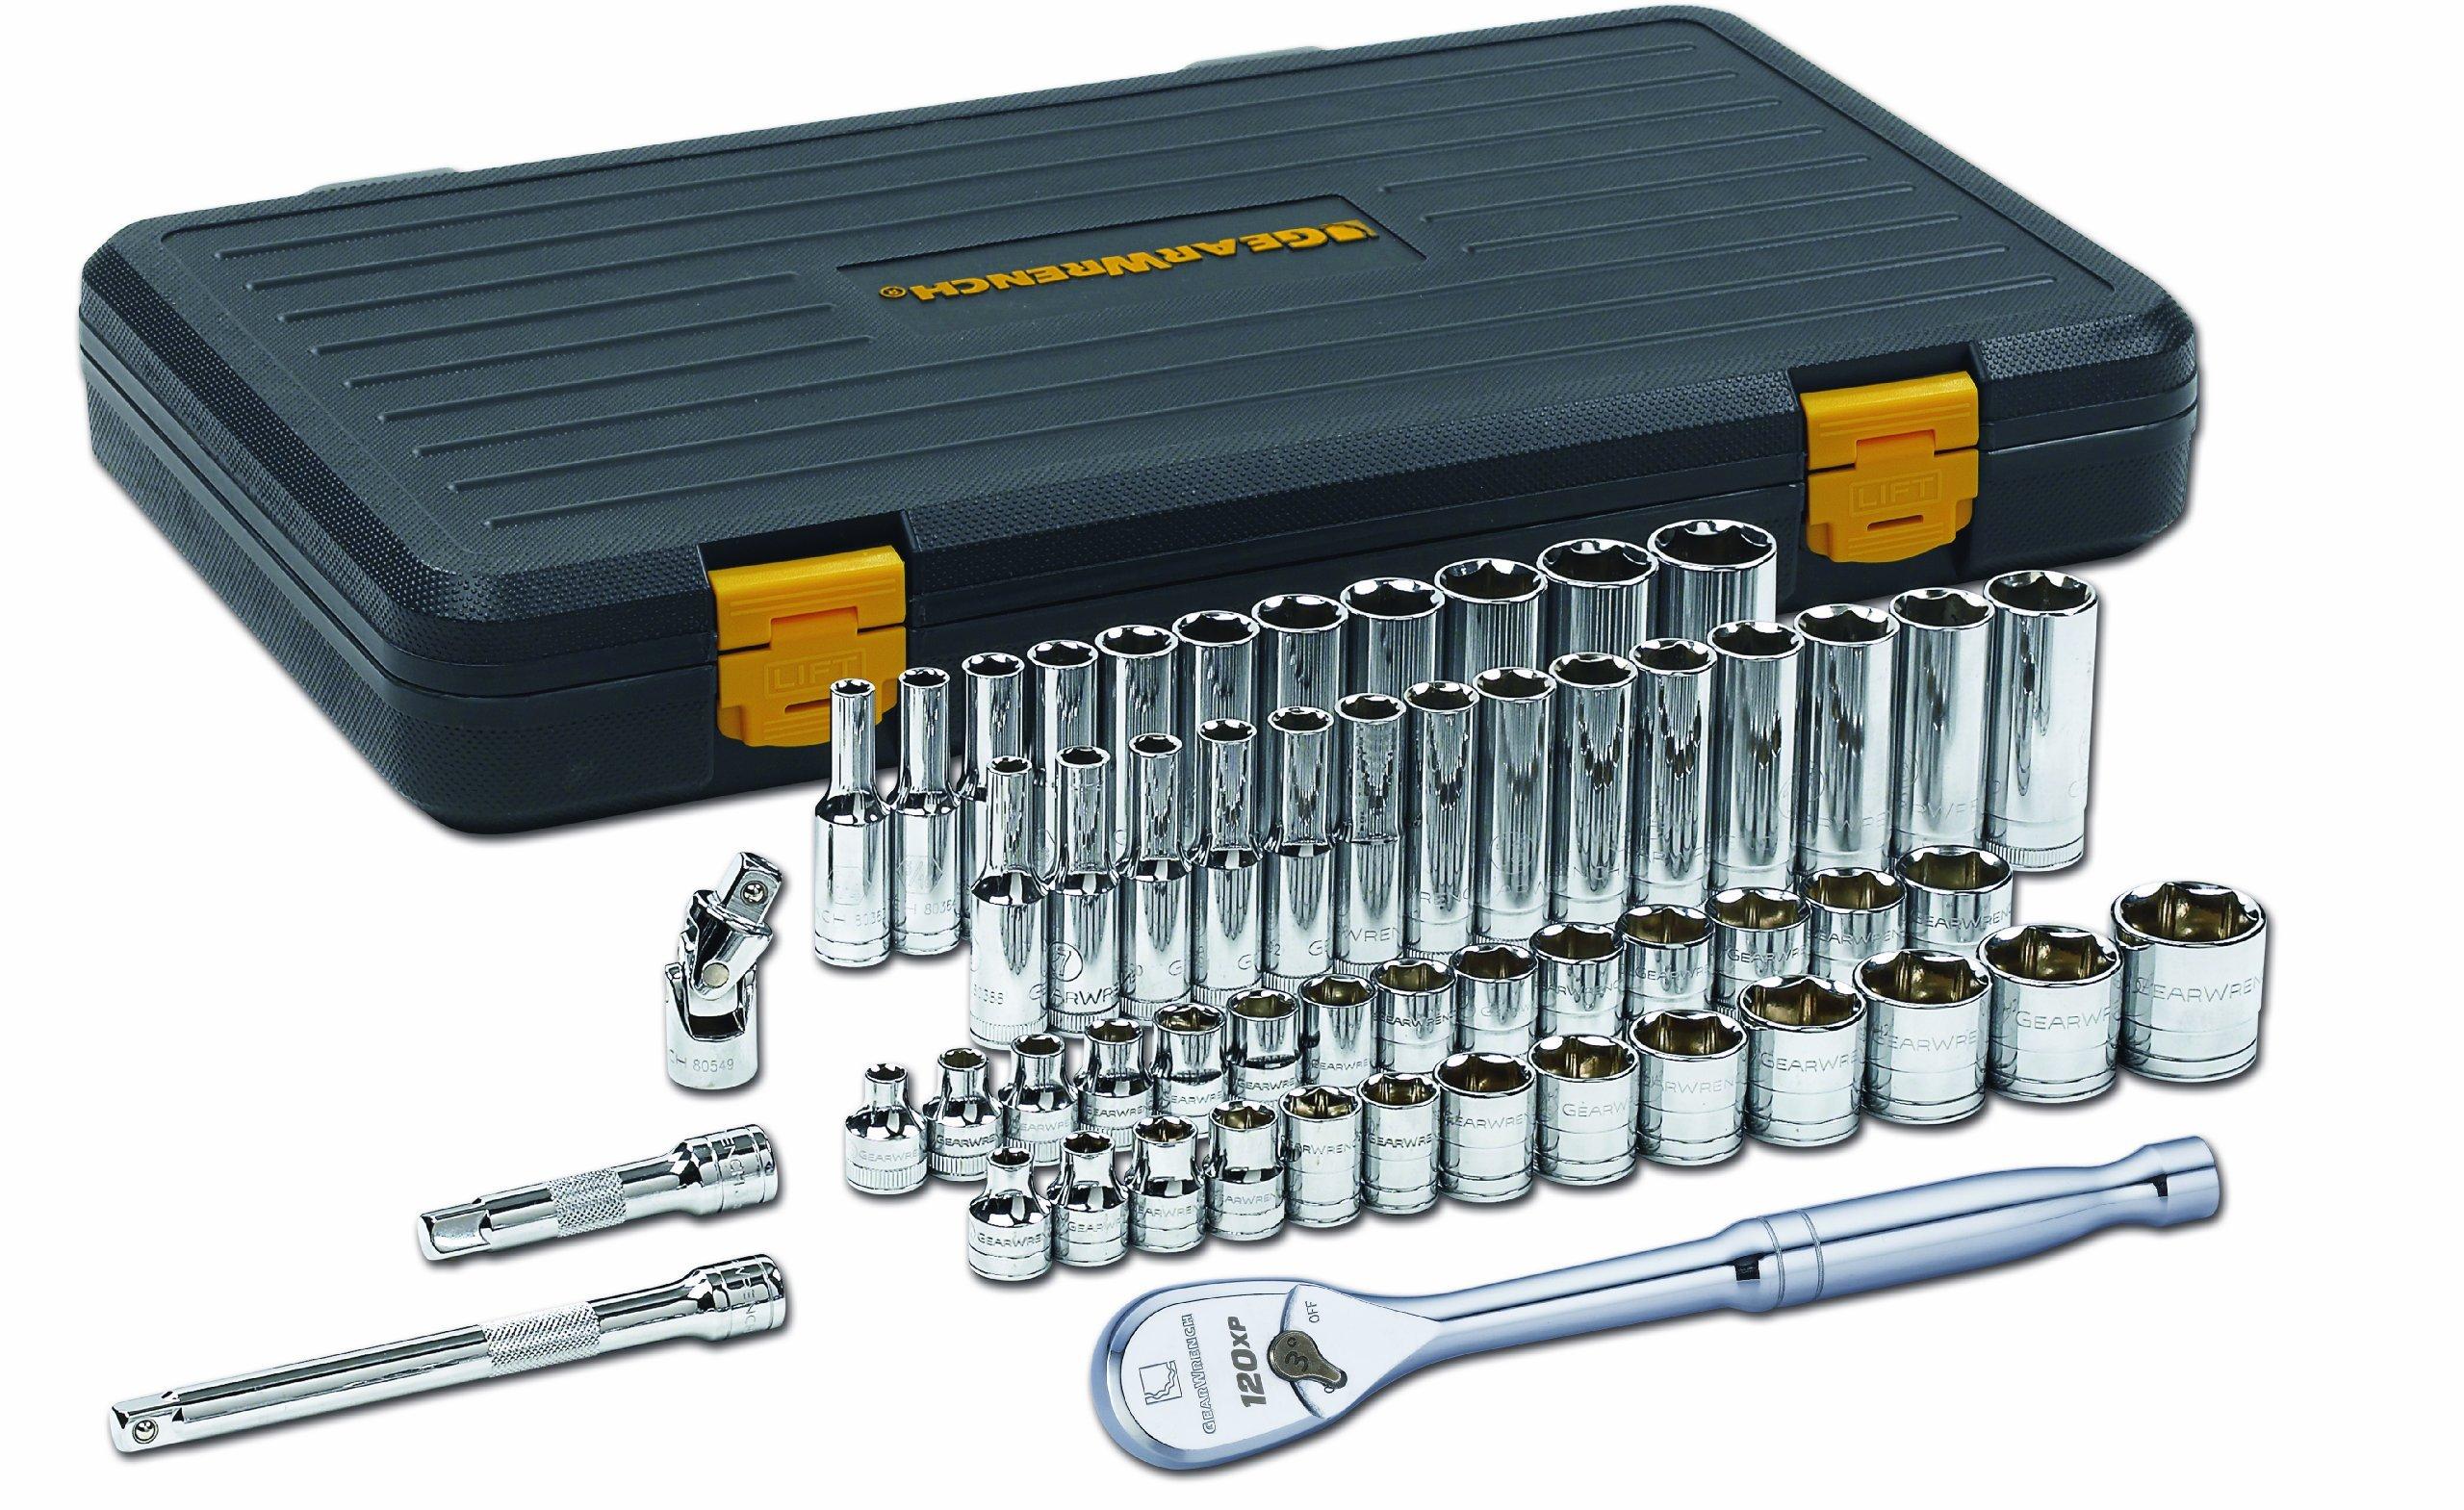 "GEARWRENCH 56 Pc. 3/8"" Drive 6 Pt. 120XP Mechanics Tool Set, Standard & Deep, SAE/Metric - 80550P"